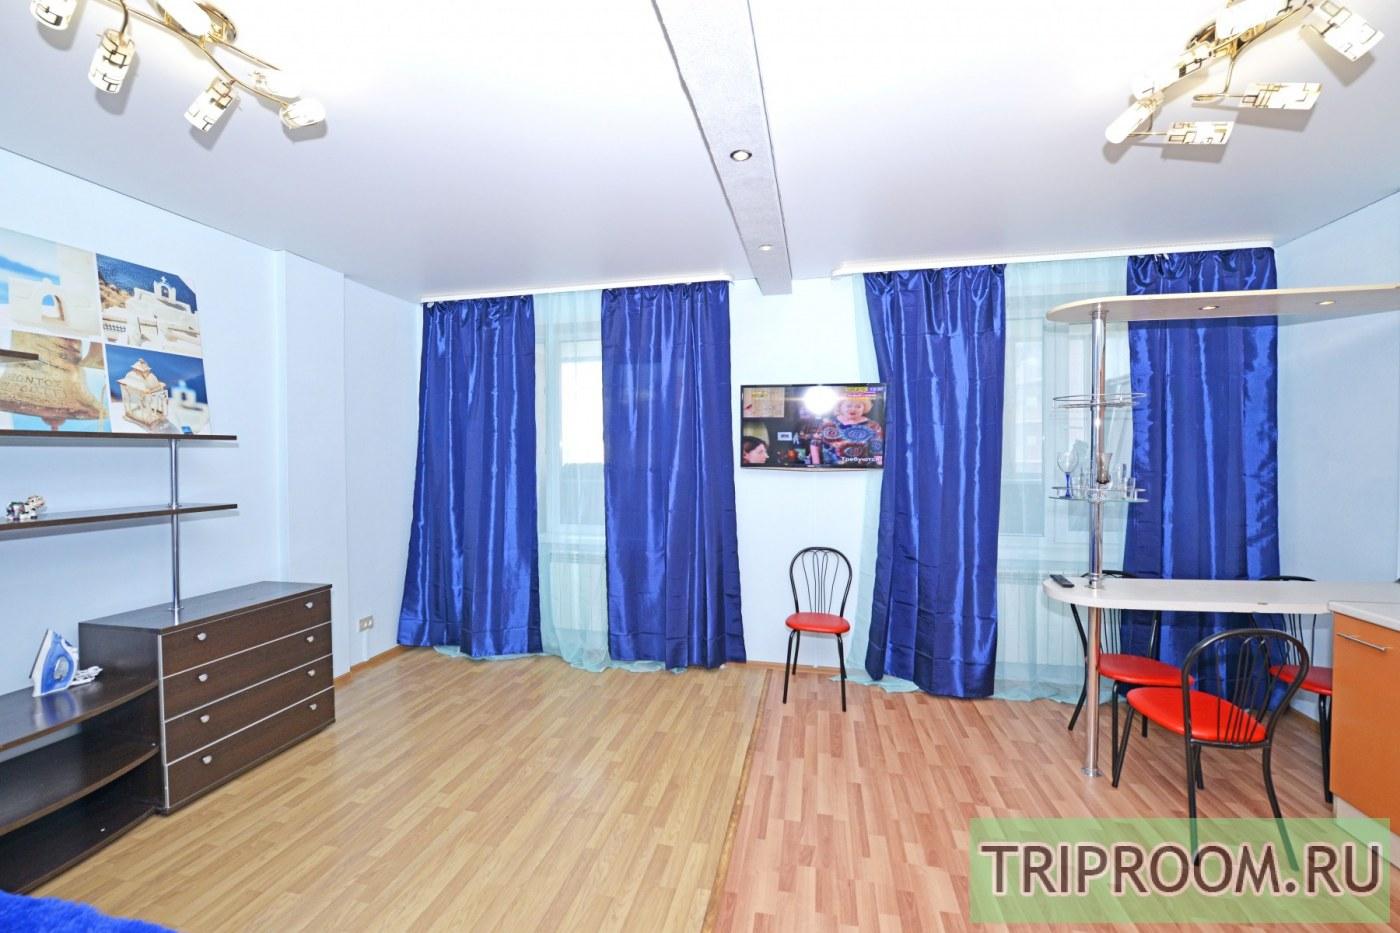 1-комнатная квартира посуточно (вариант № 40607), ул. Галущака улица, фото № 3